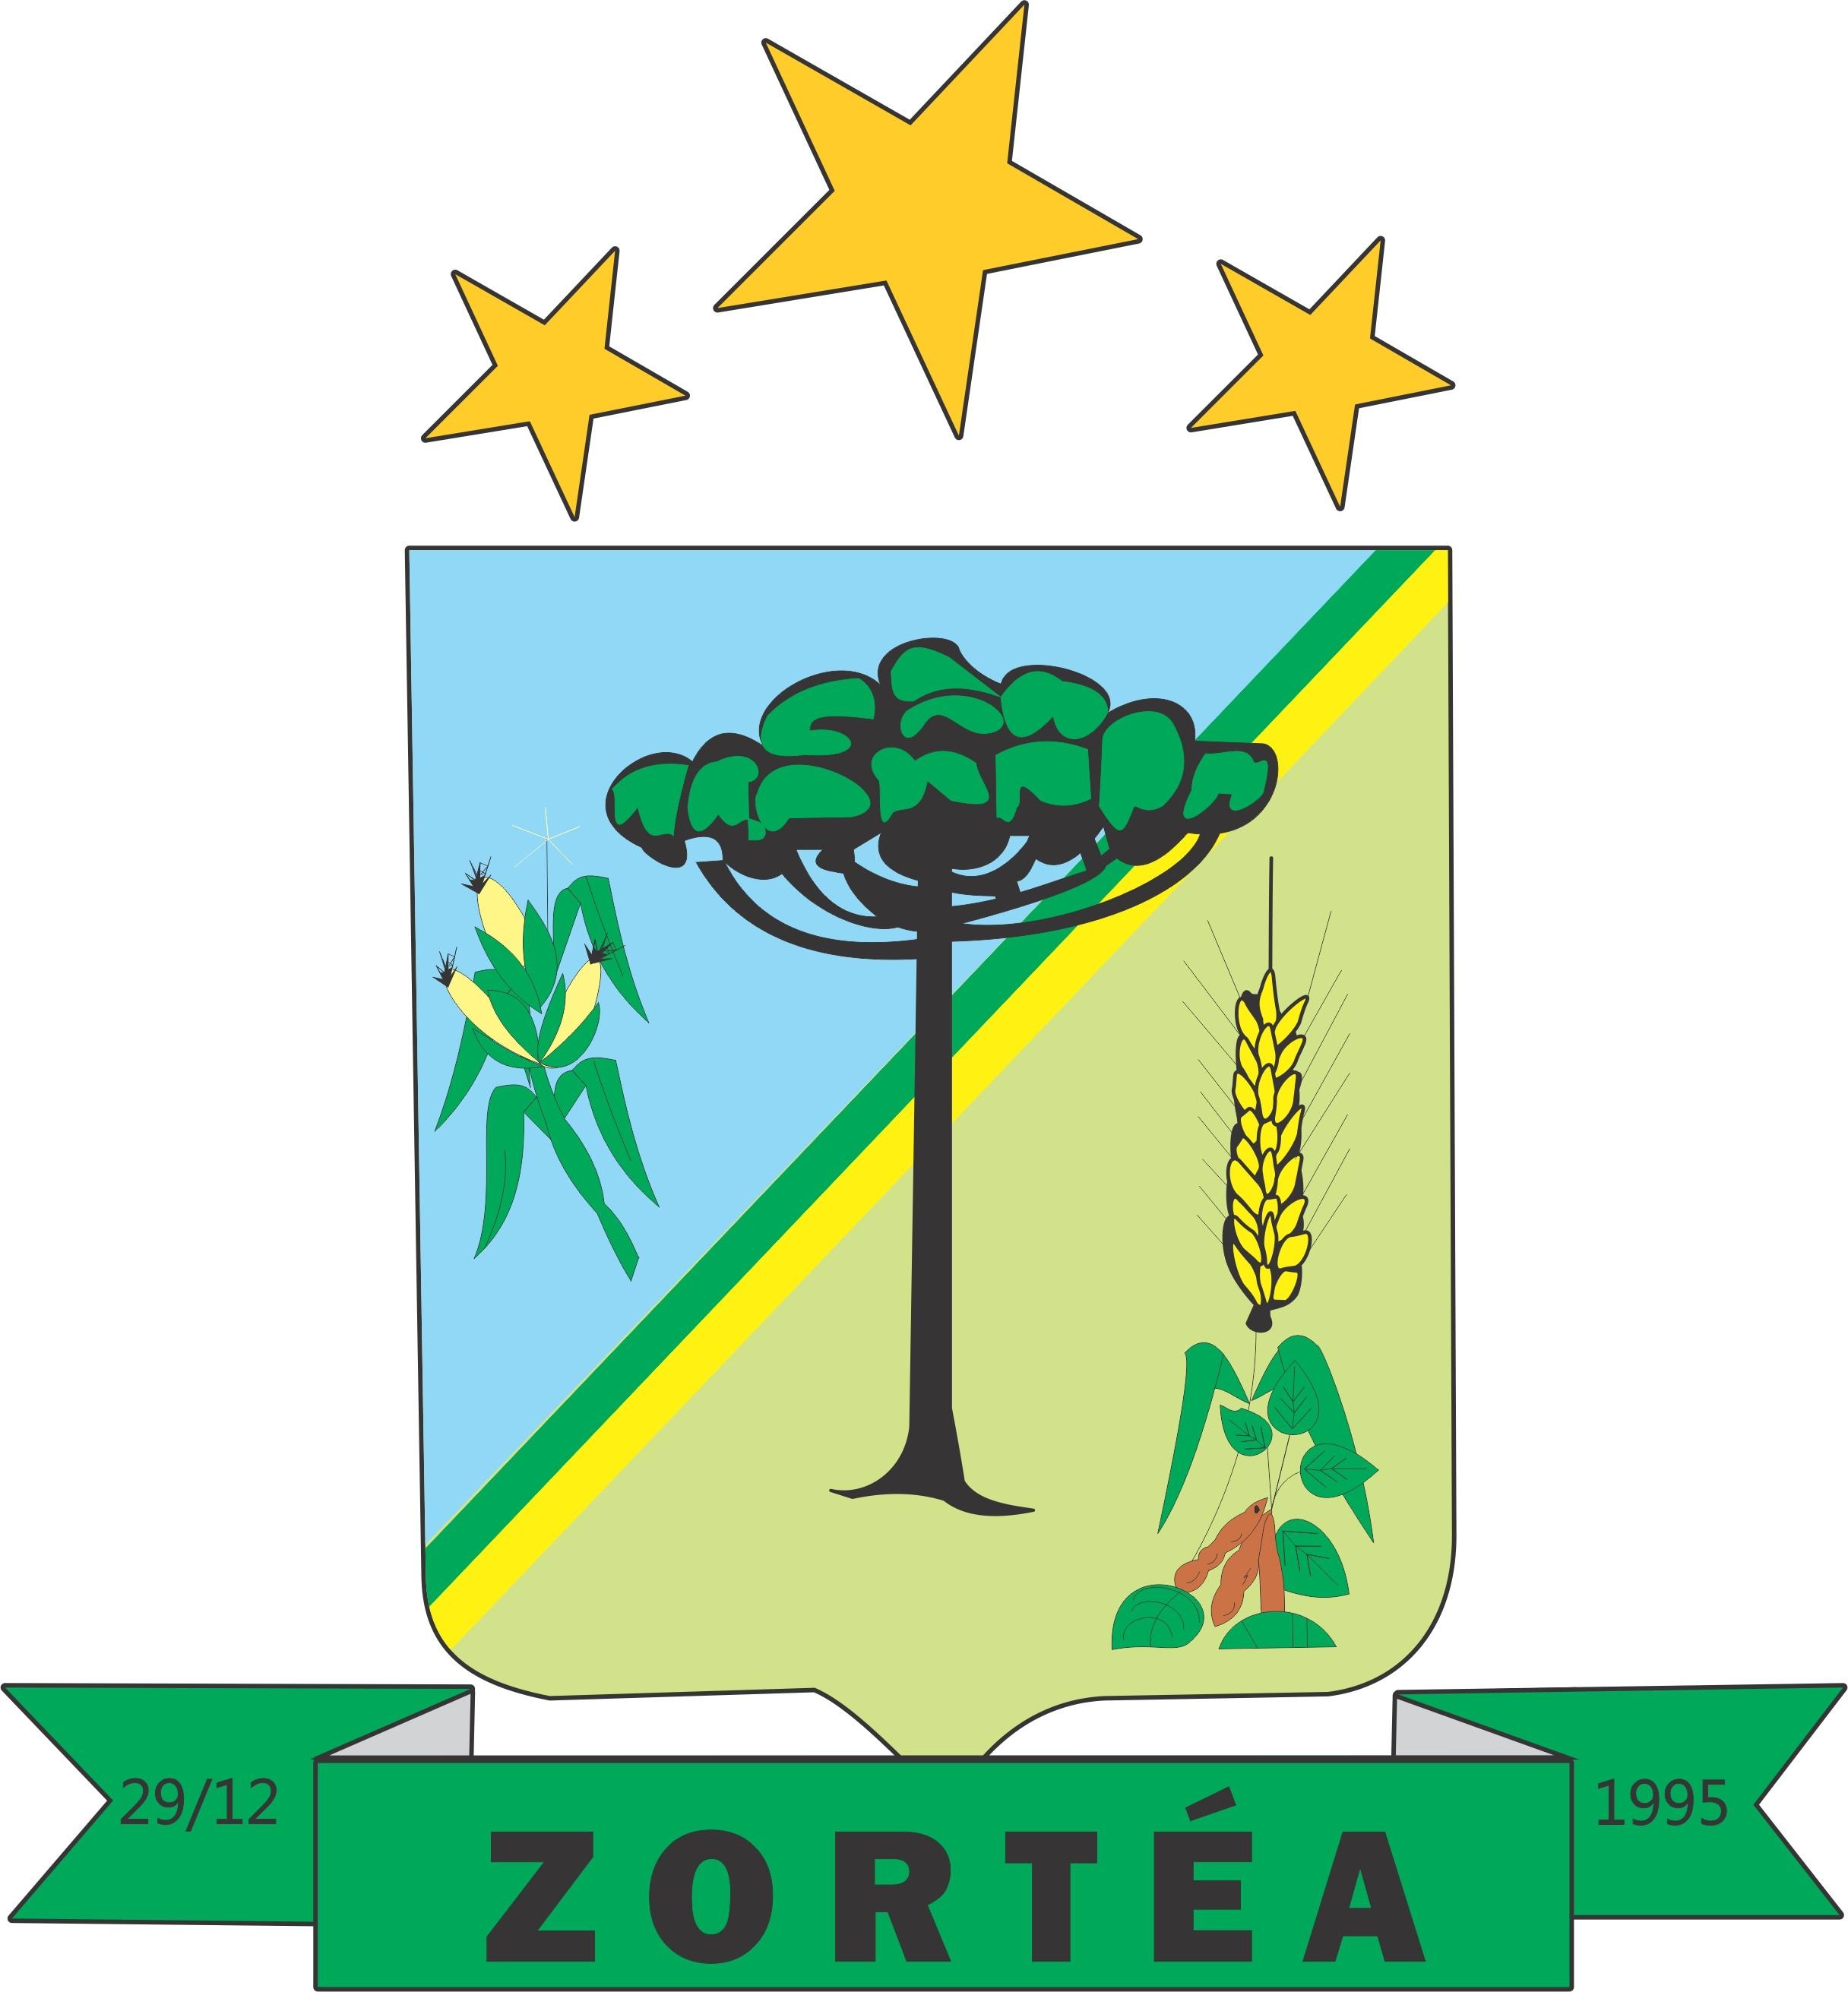 Município de Zortea